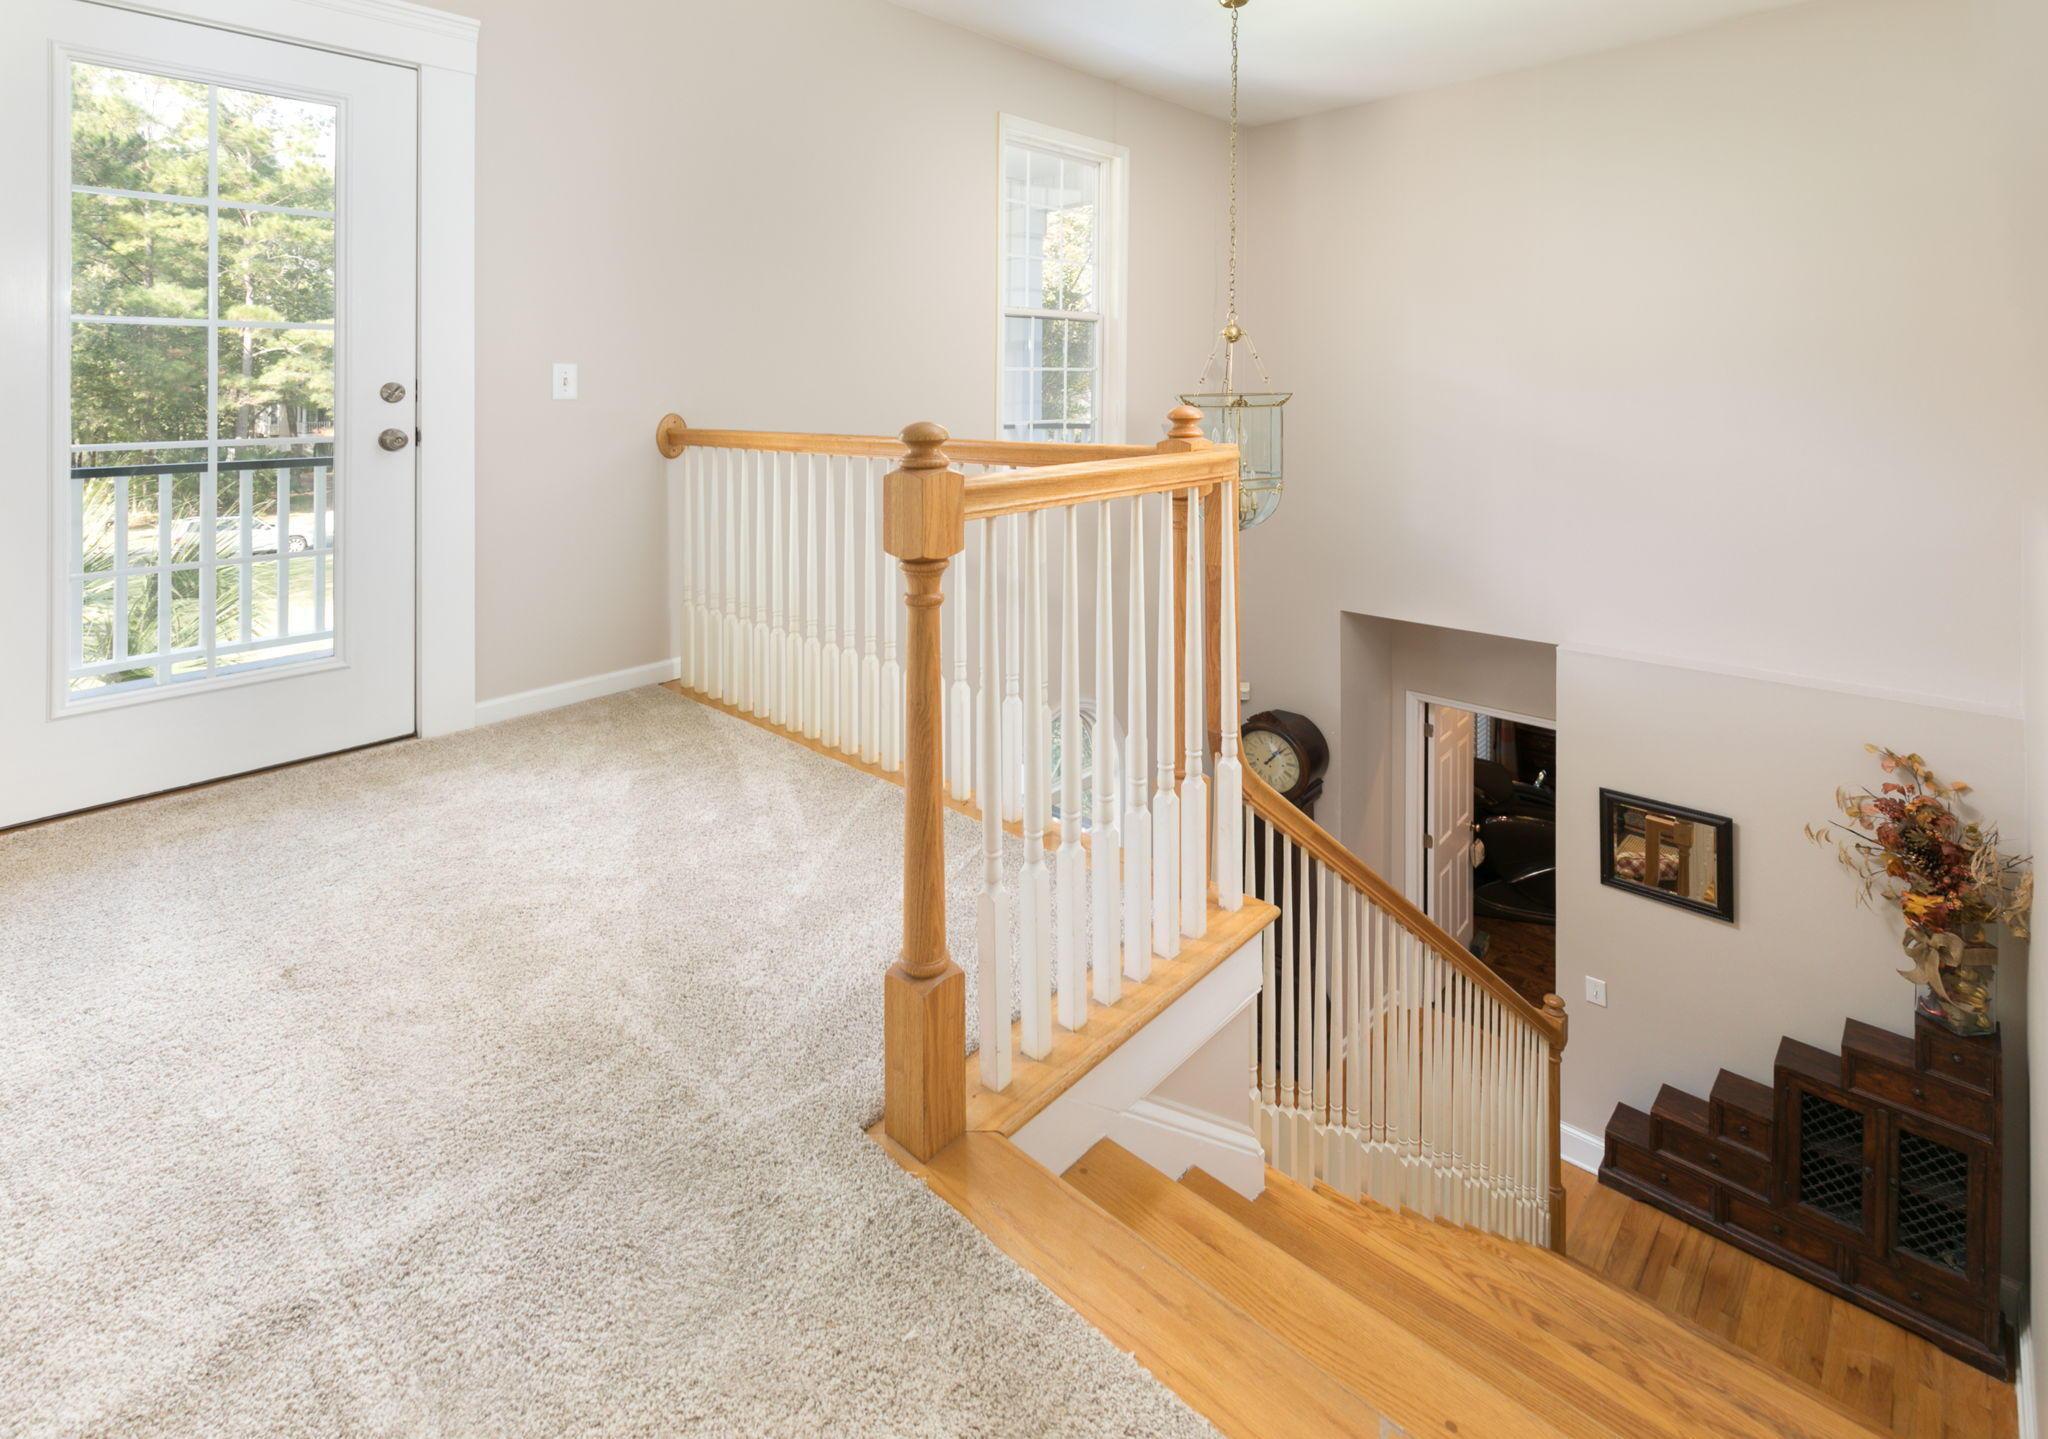 Dunes West Homes For Sale - 3625 Colonel Vanderhorst, Mount Pleasant, SC - 6